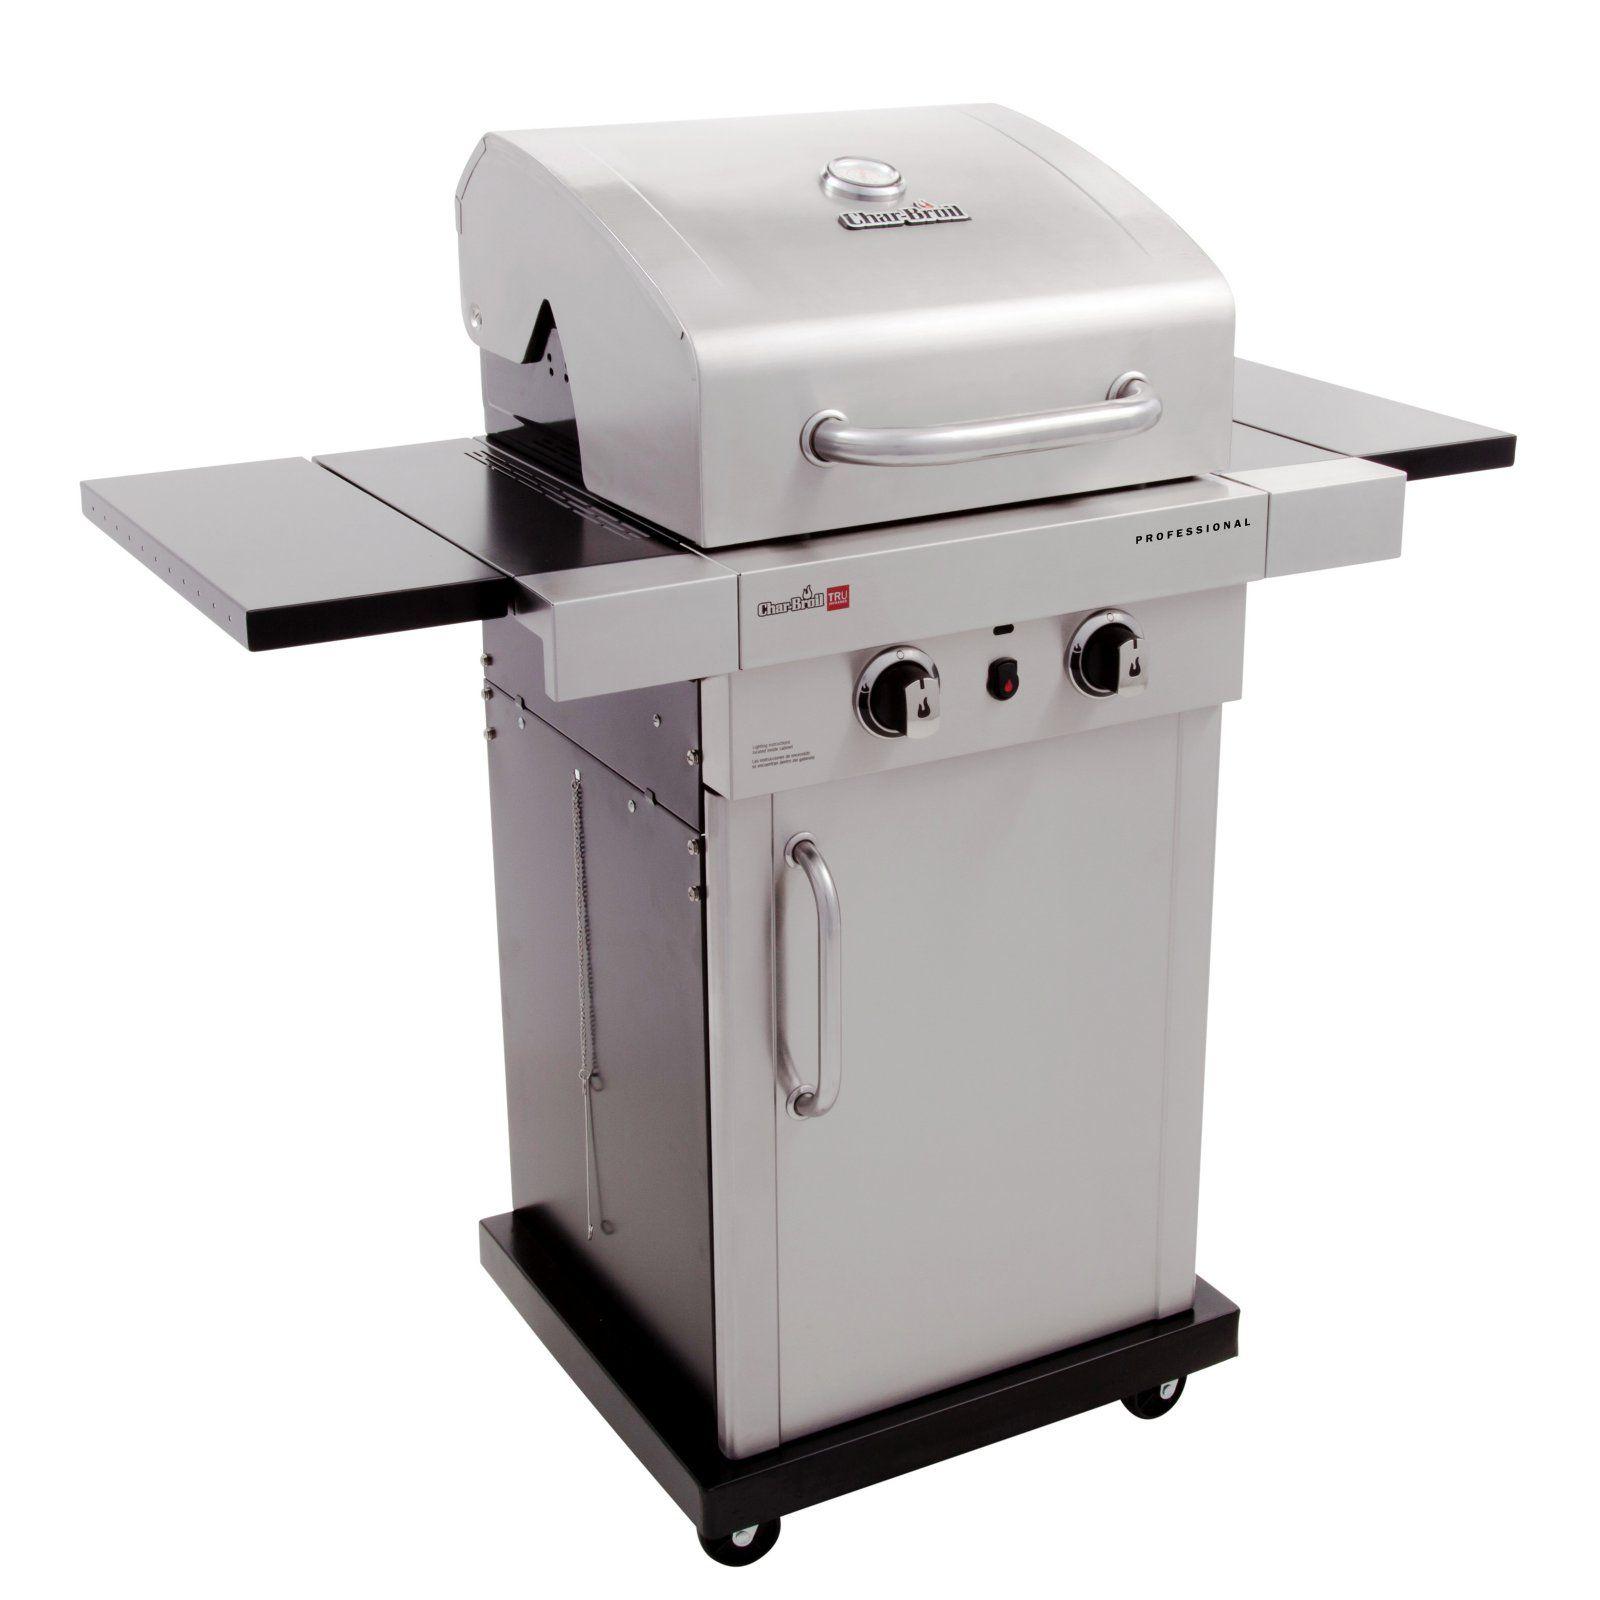 Char-Broil Signature TRU-Infrared 325 2-Burner Cabinet Gas Grill